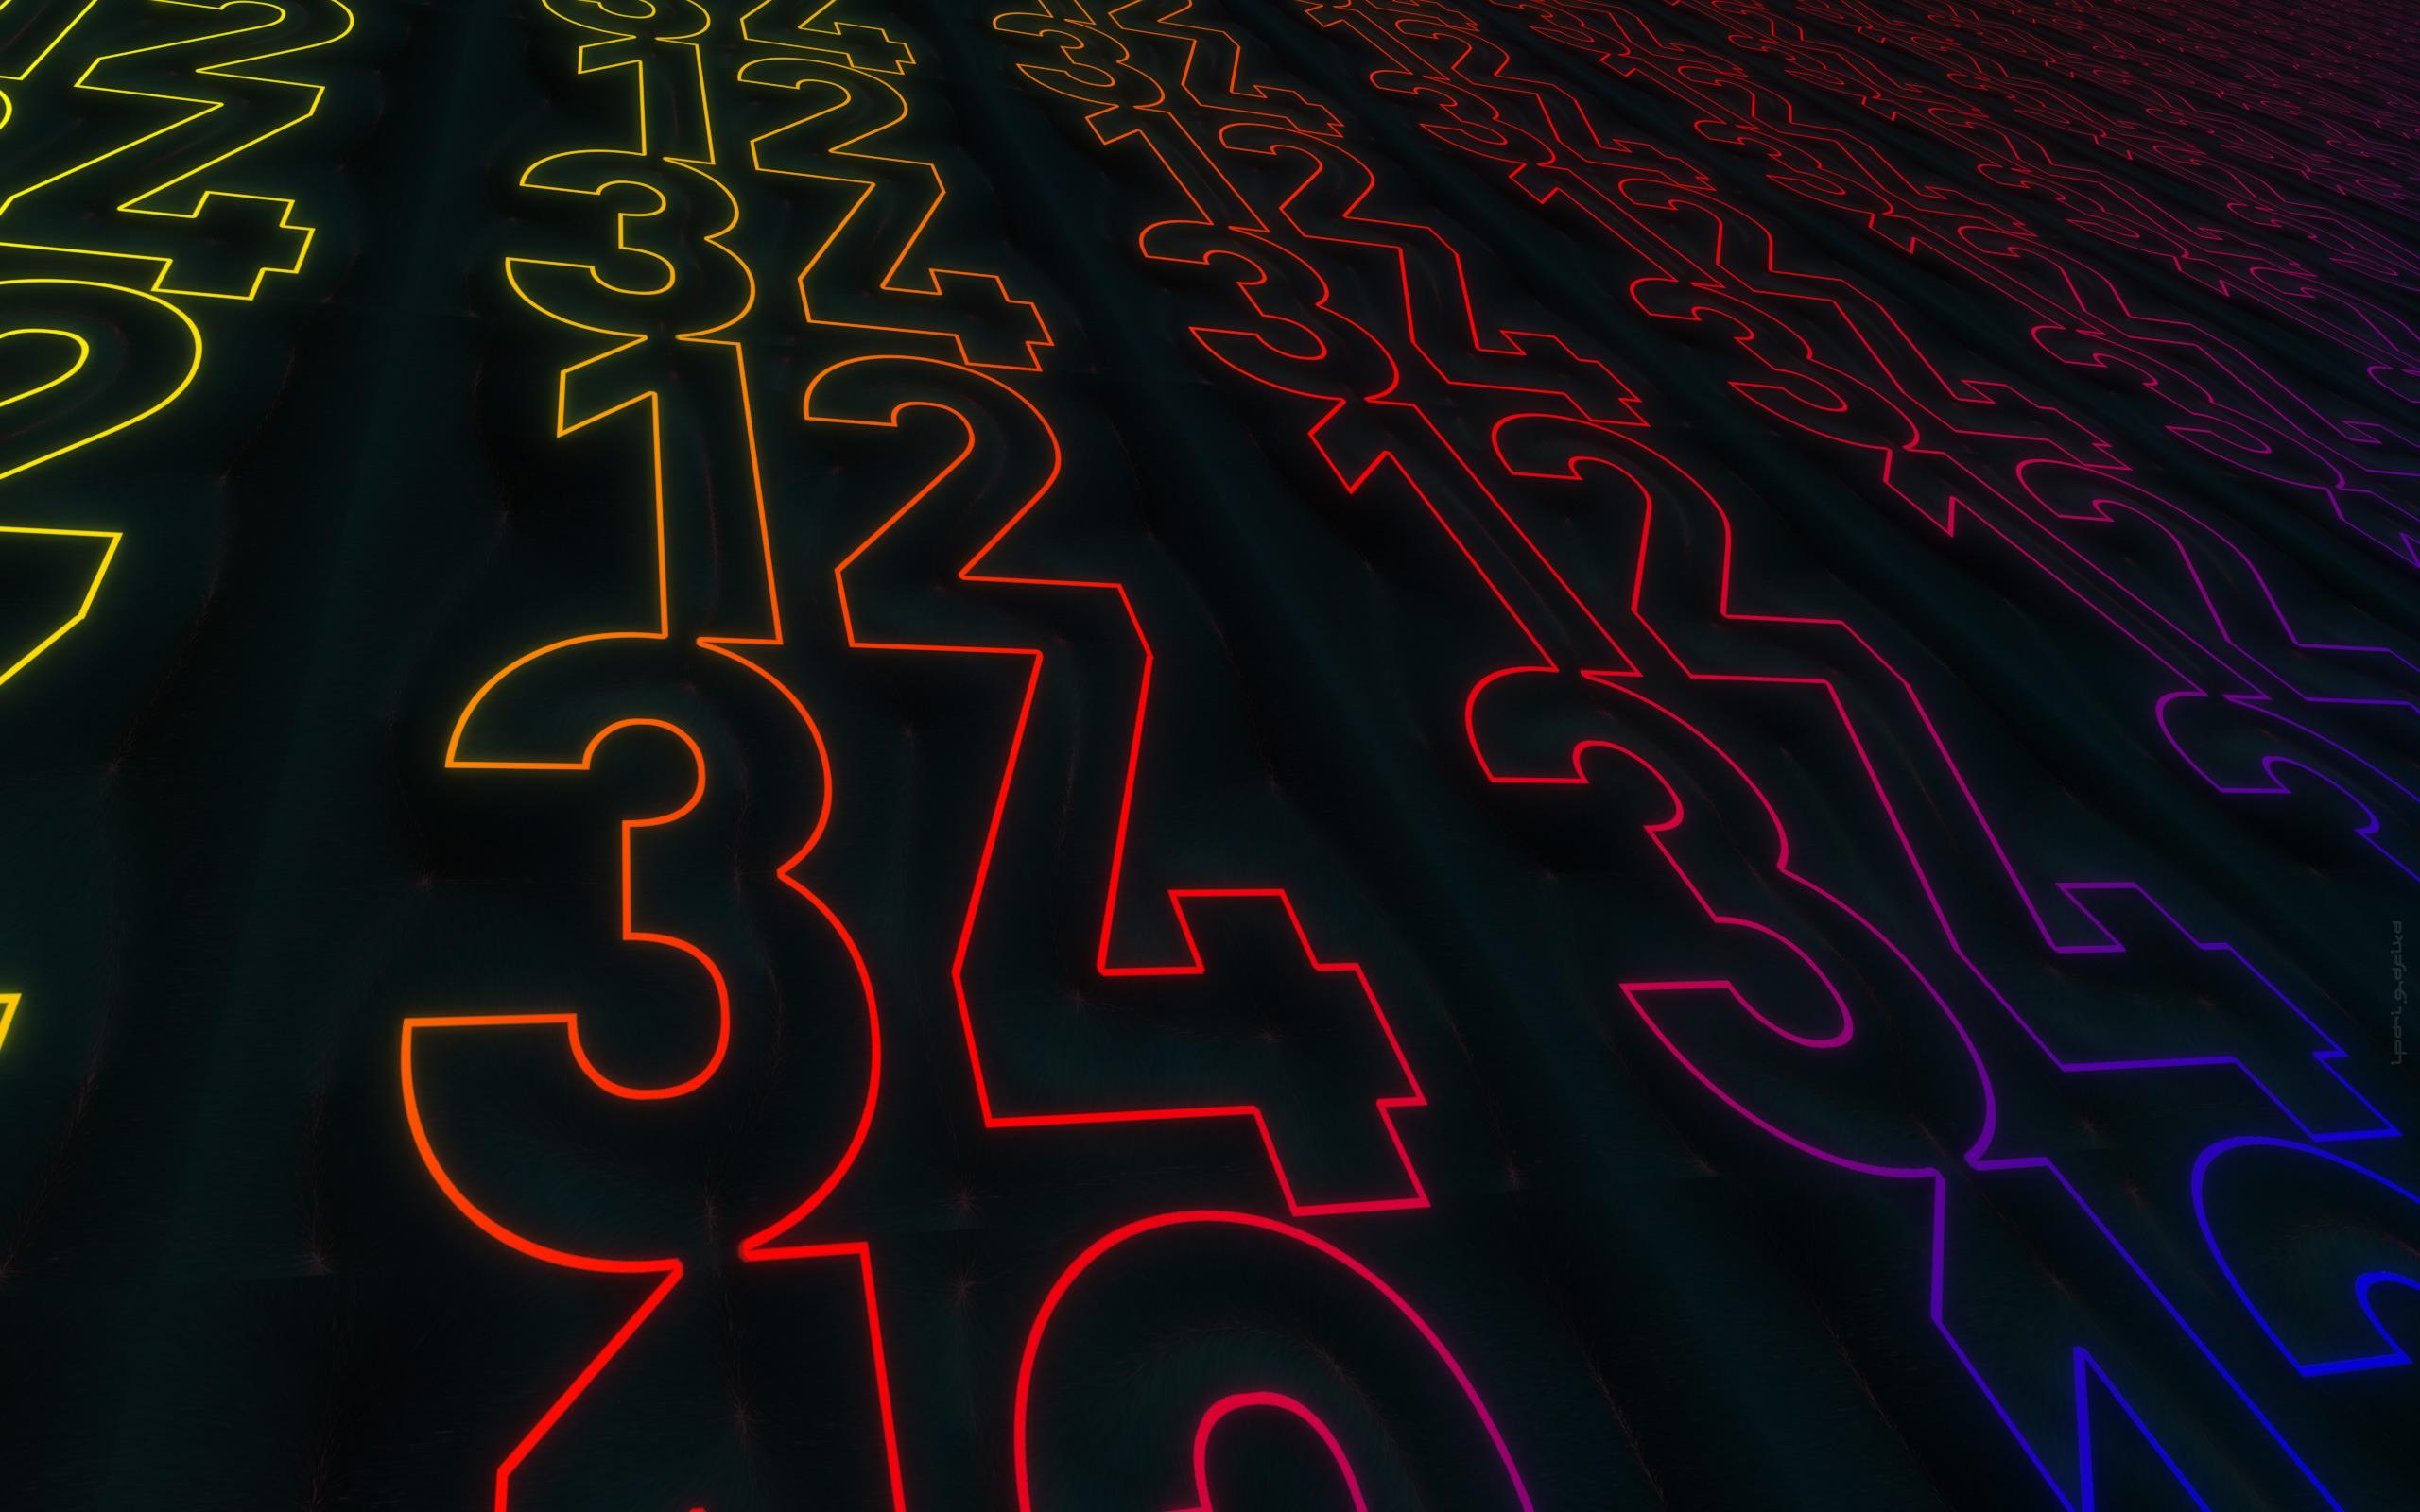 wallpaper number slight guitor, number, slight